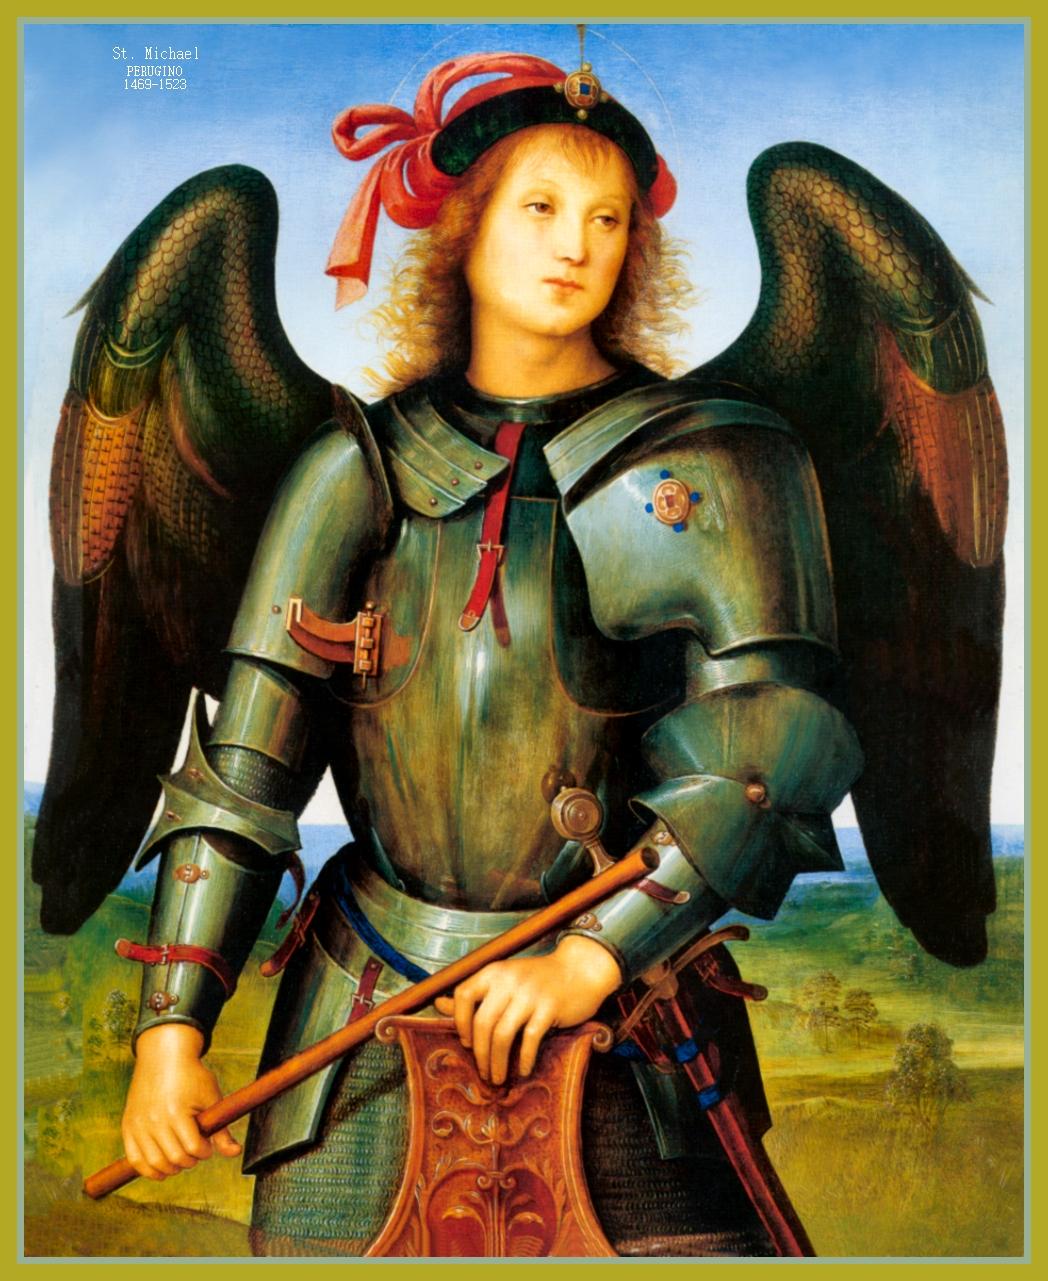 http://www.catholictradition.org/saint-michael1.jpg